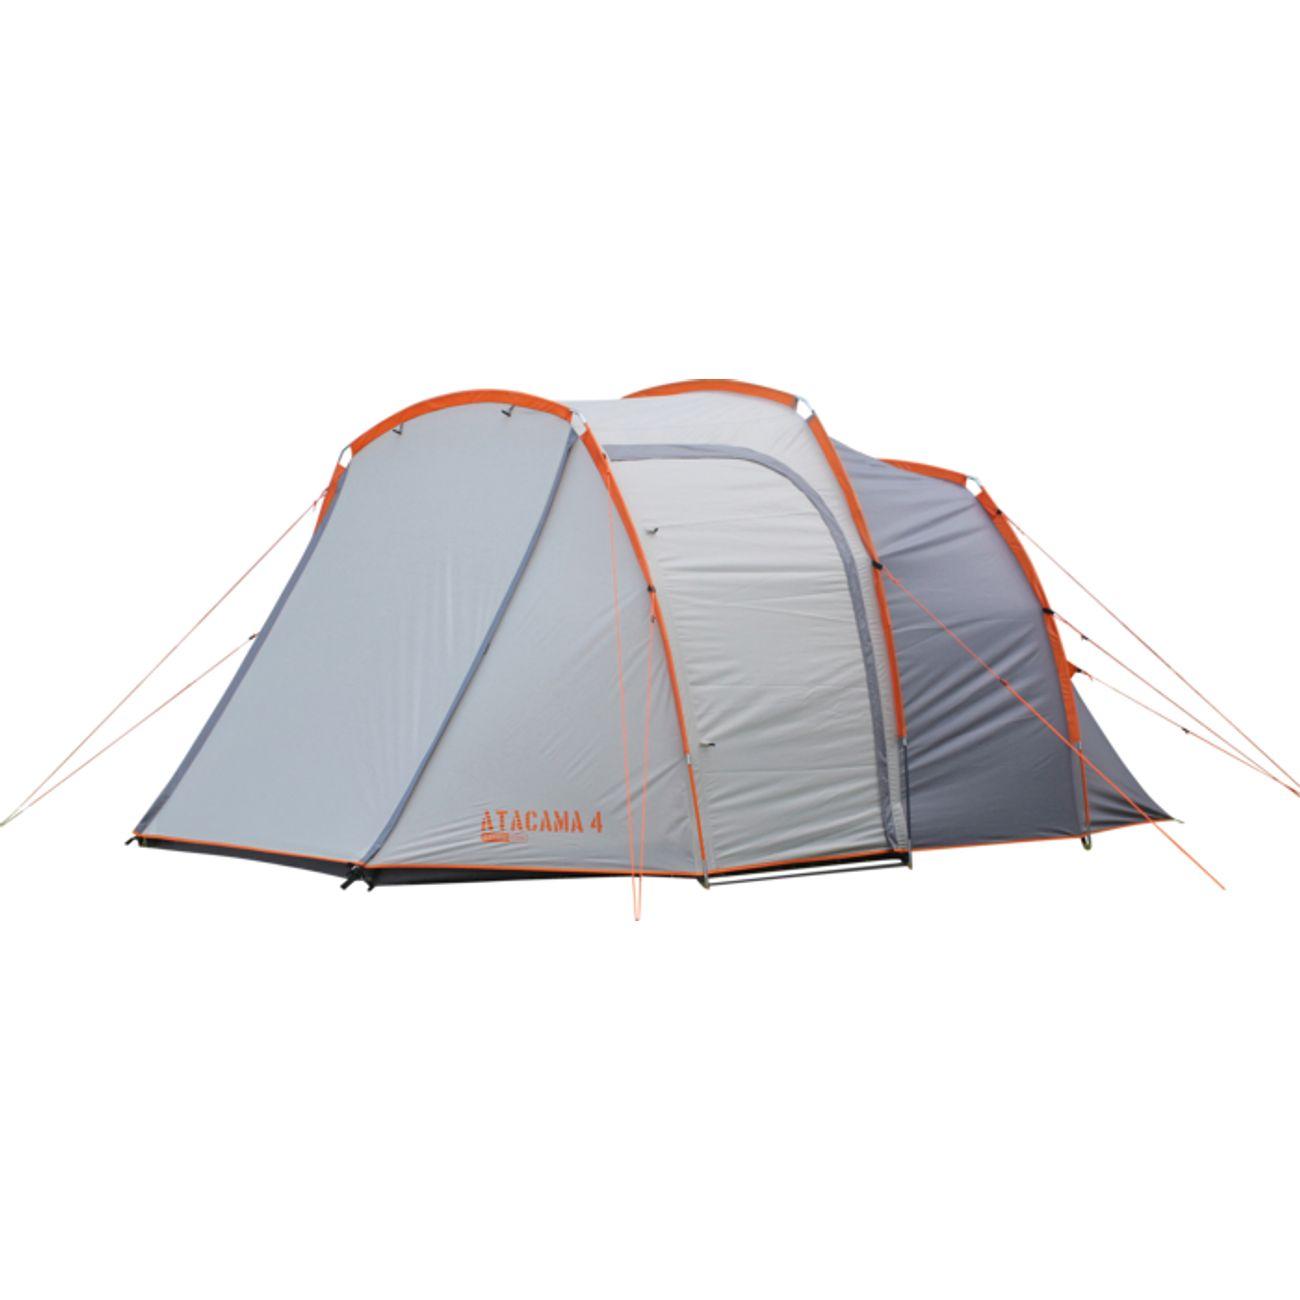 TENTE Camping  WANABEE ATACAMA 4 TUNNEL